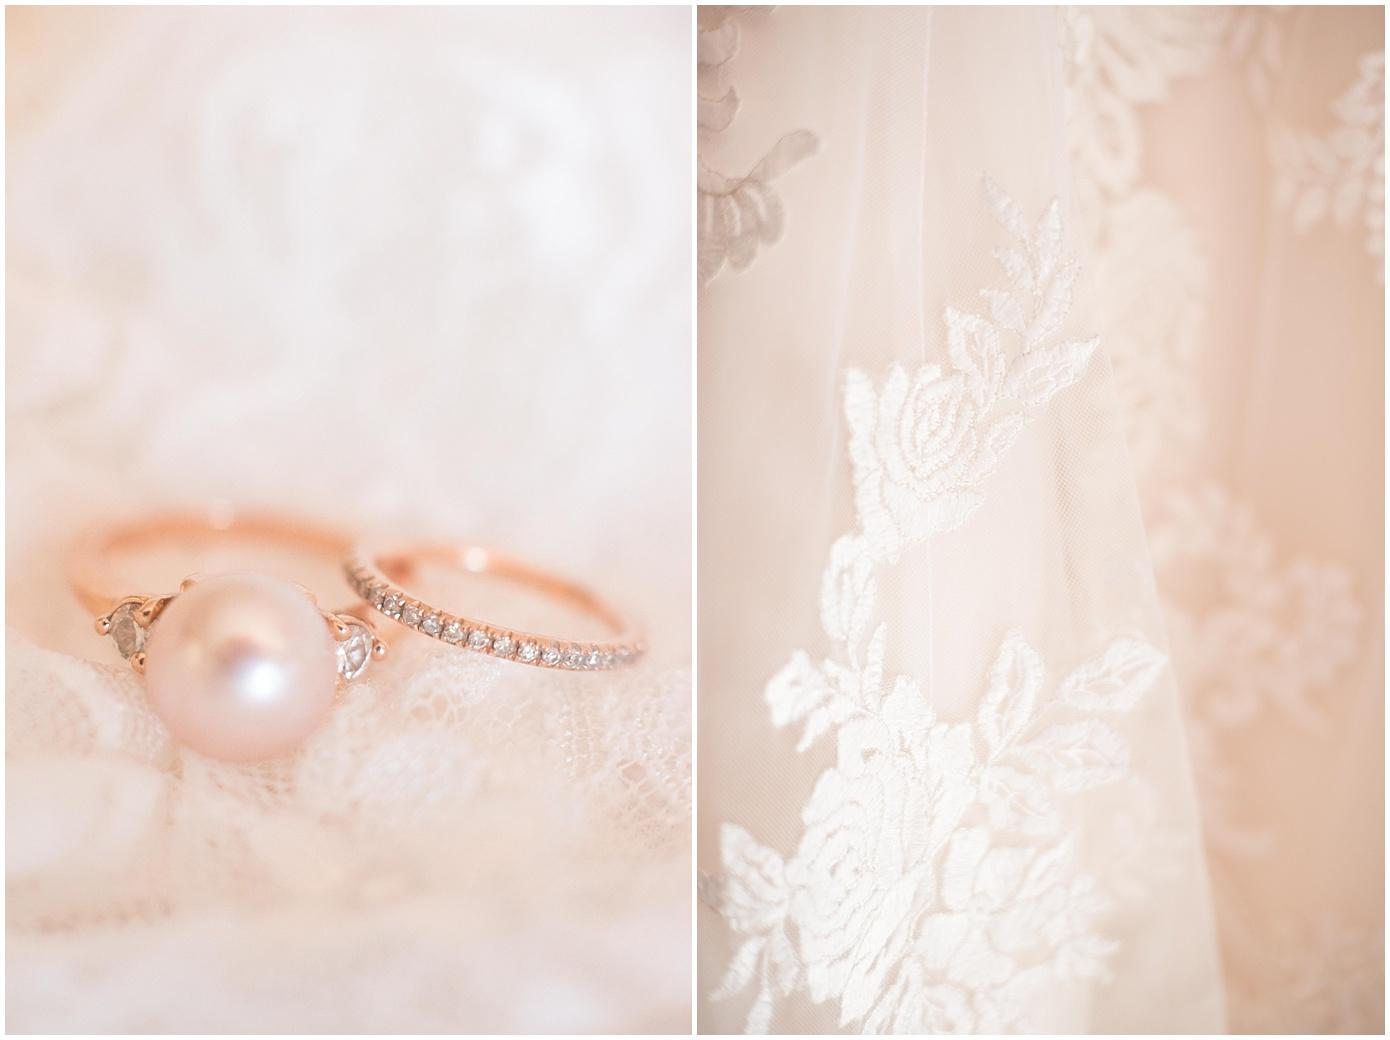 kayla kitts photography-justine-brian-wedding-balloon-fiesta_0009.jpg